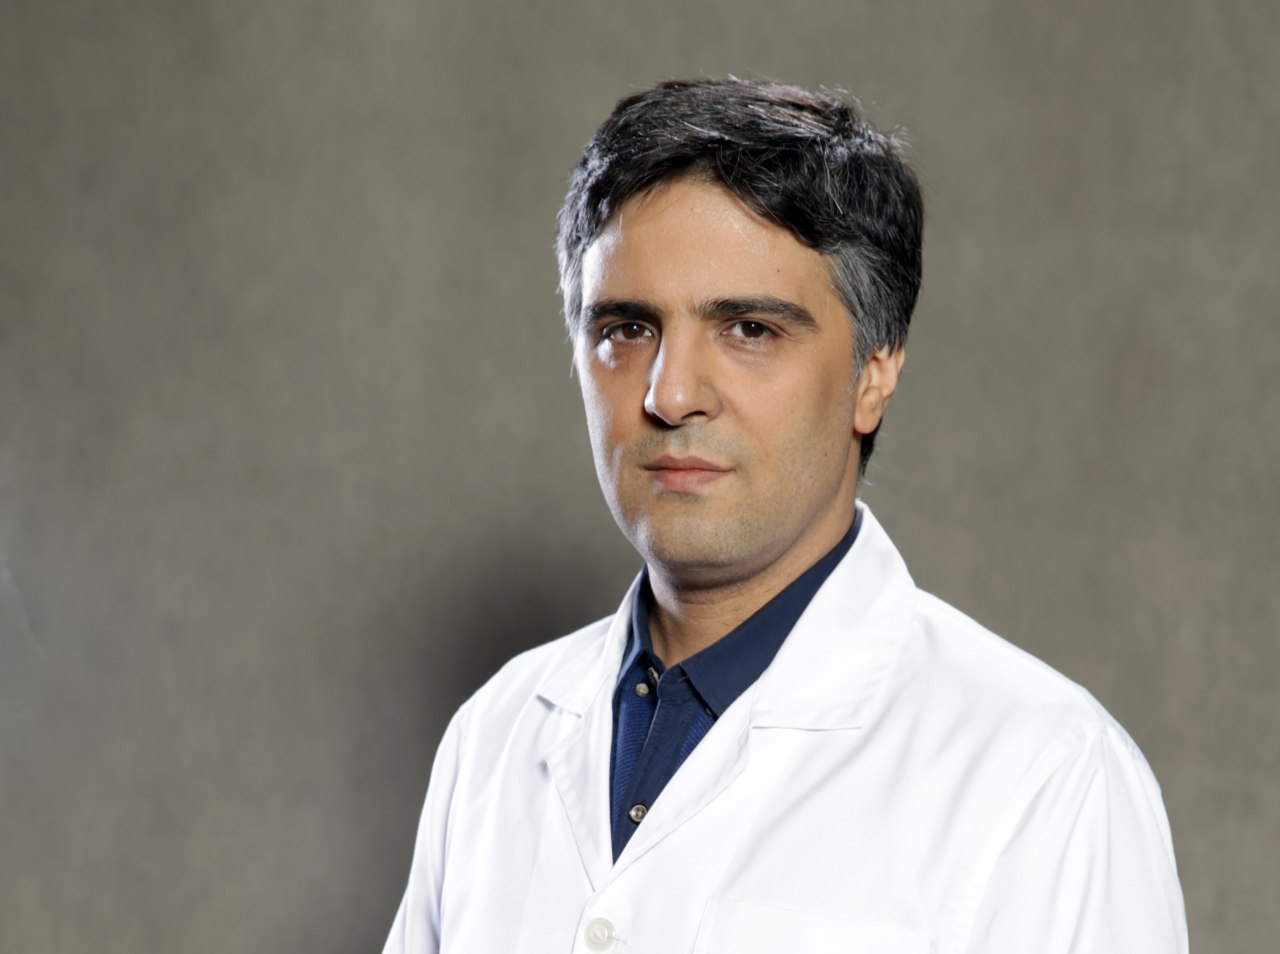 دکتر سعید مهرپور متخصص ارتوپدی